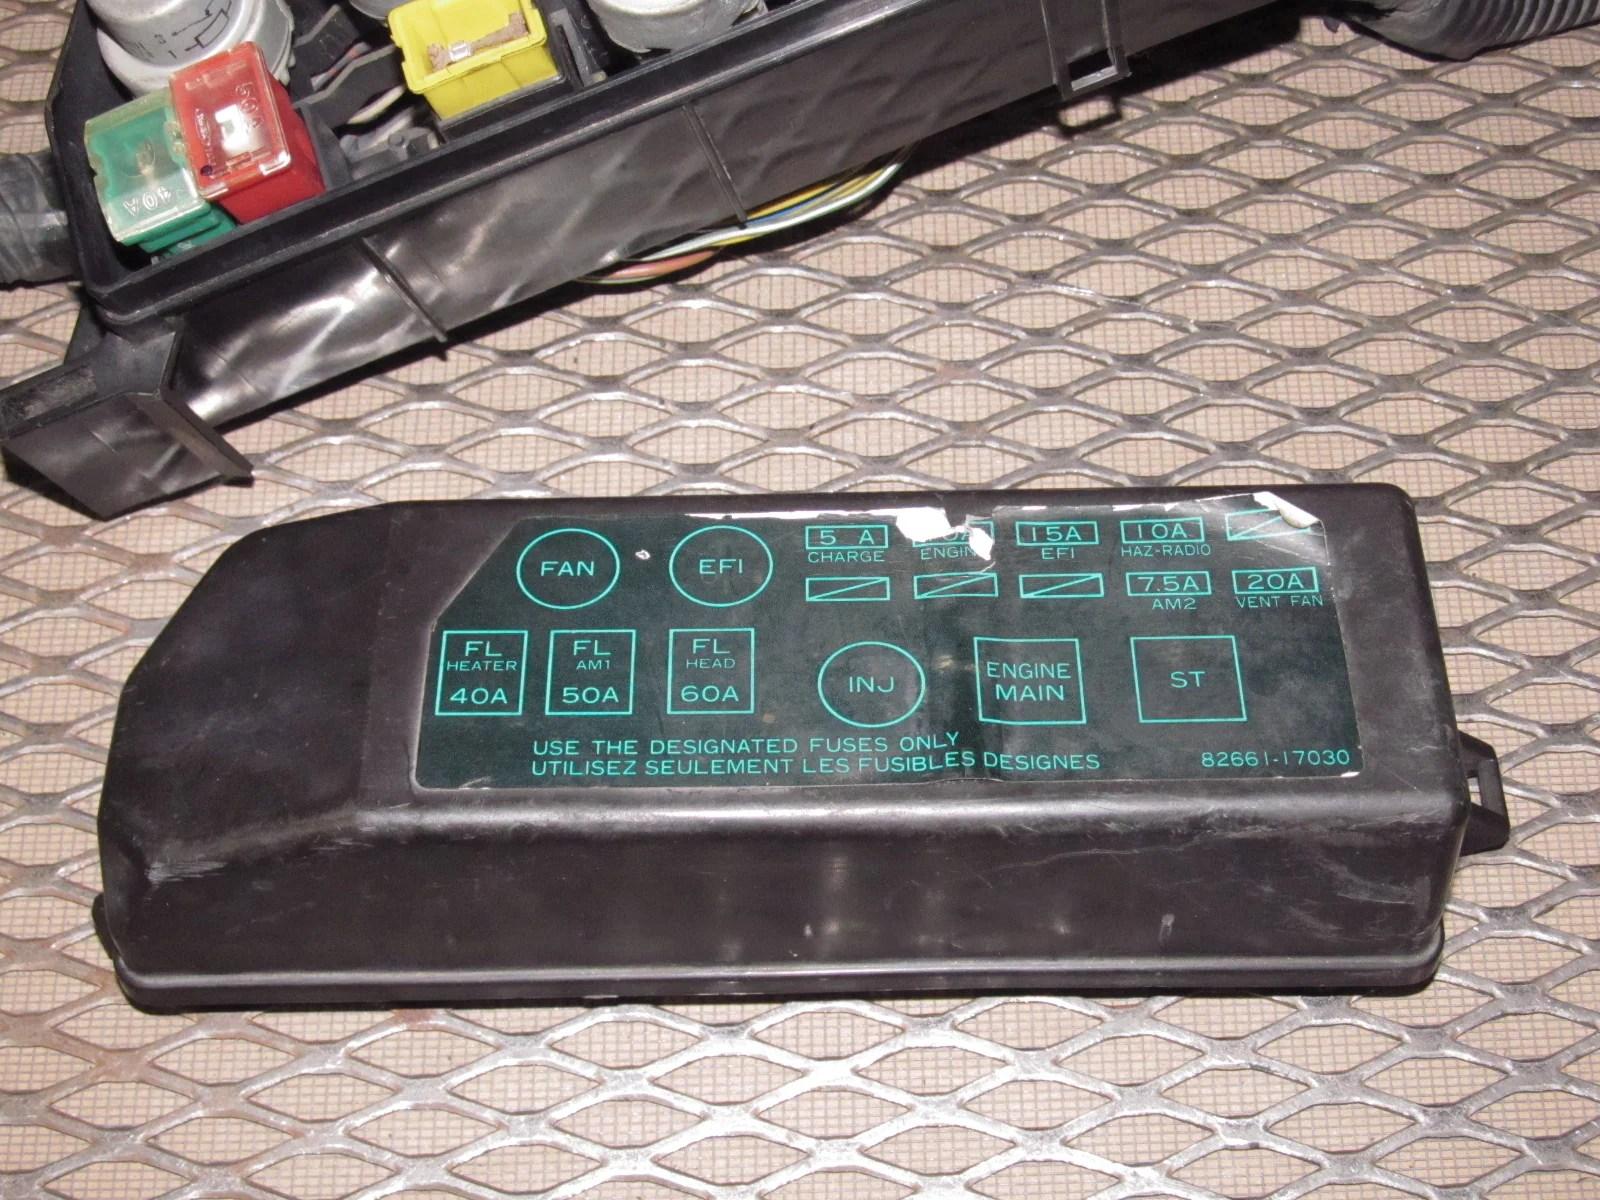 85 86 toyota mr2 oem engine fuse box autopartone com 1986 toyota mr2 engine fuse box [ 1600 x 1200 Pixel ]